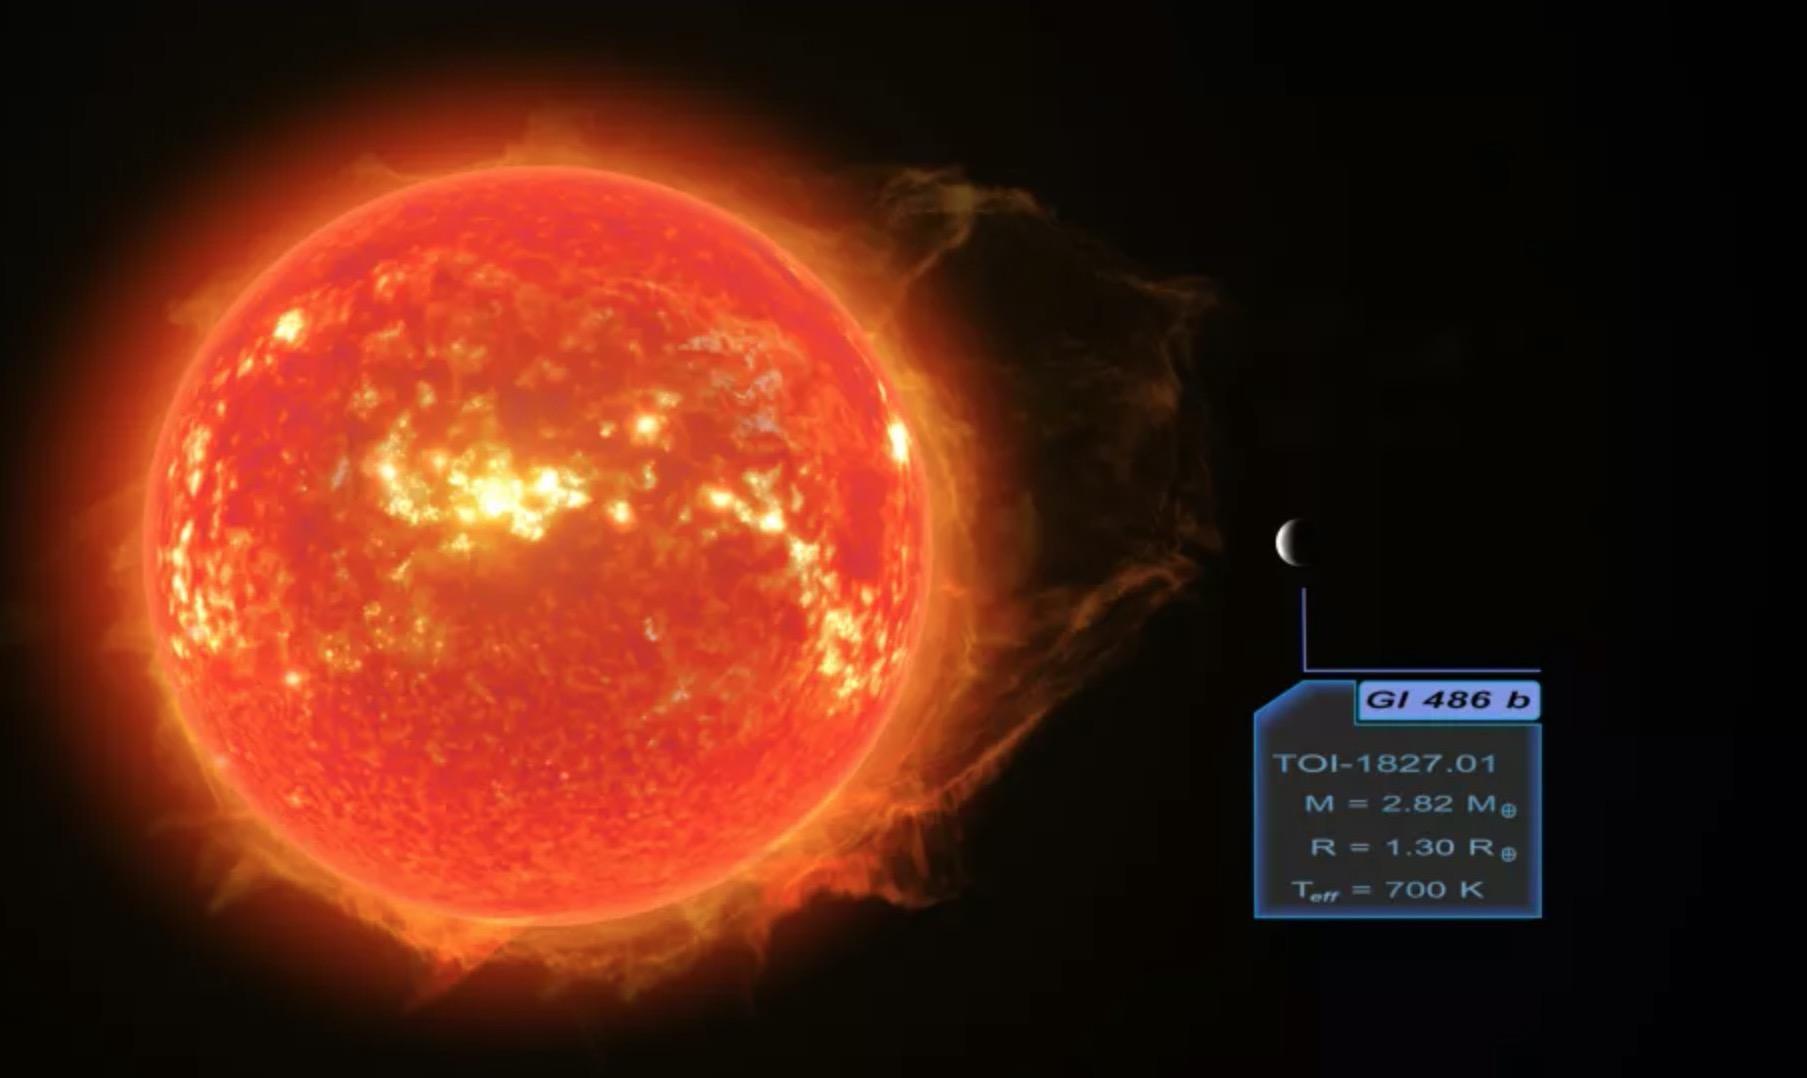 exoplanet Gliese 486 b